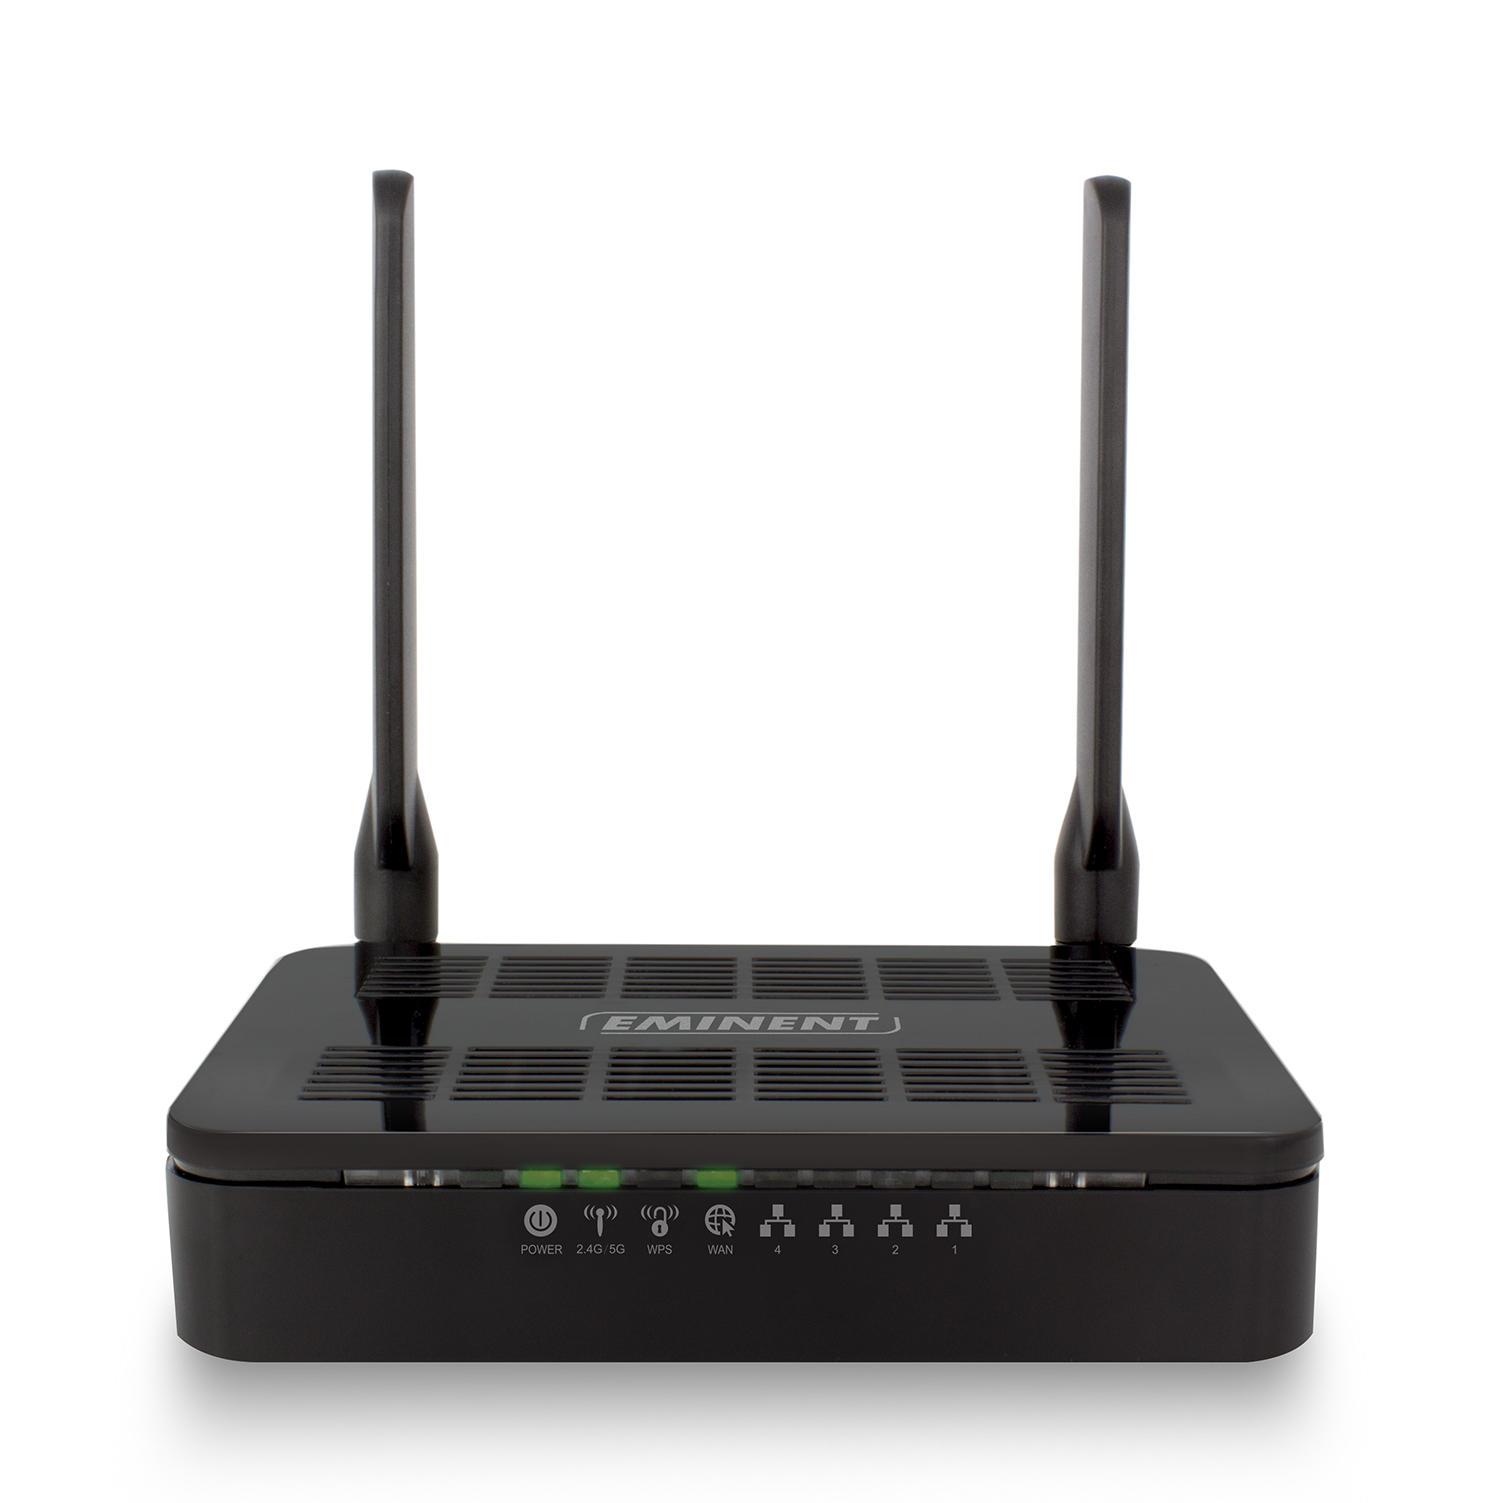 Eminent EM4710 router